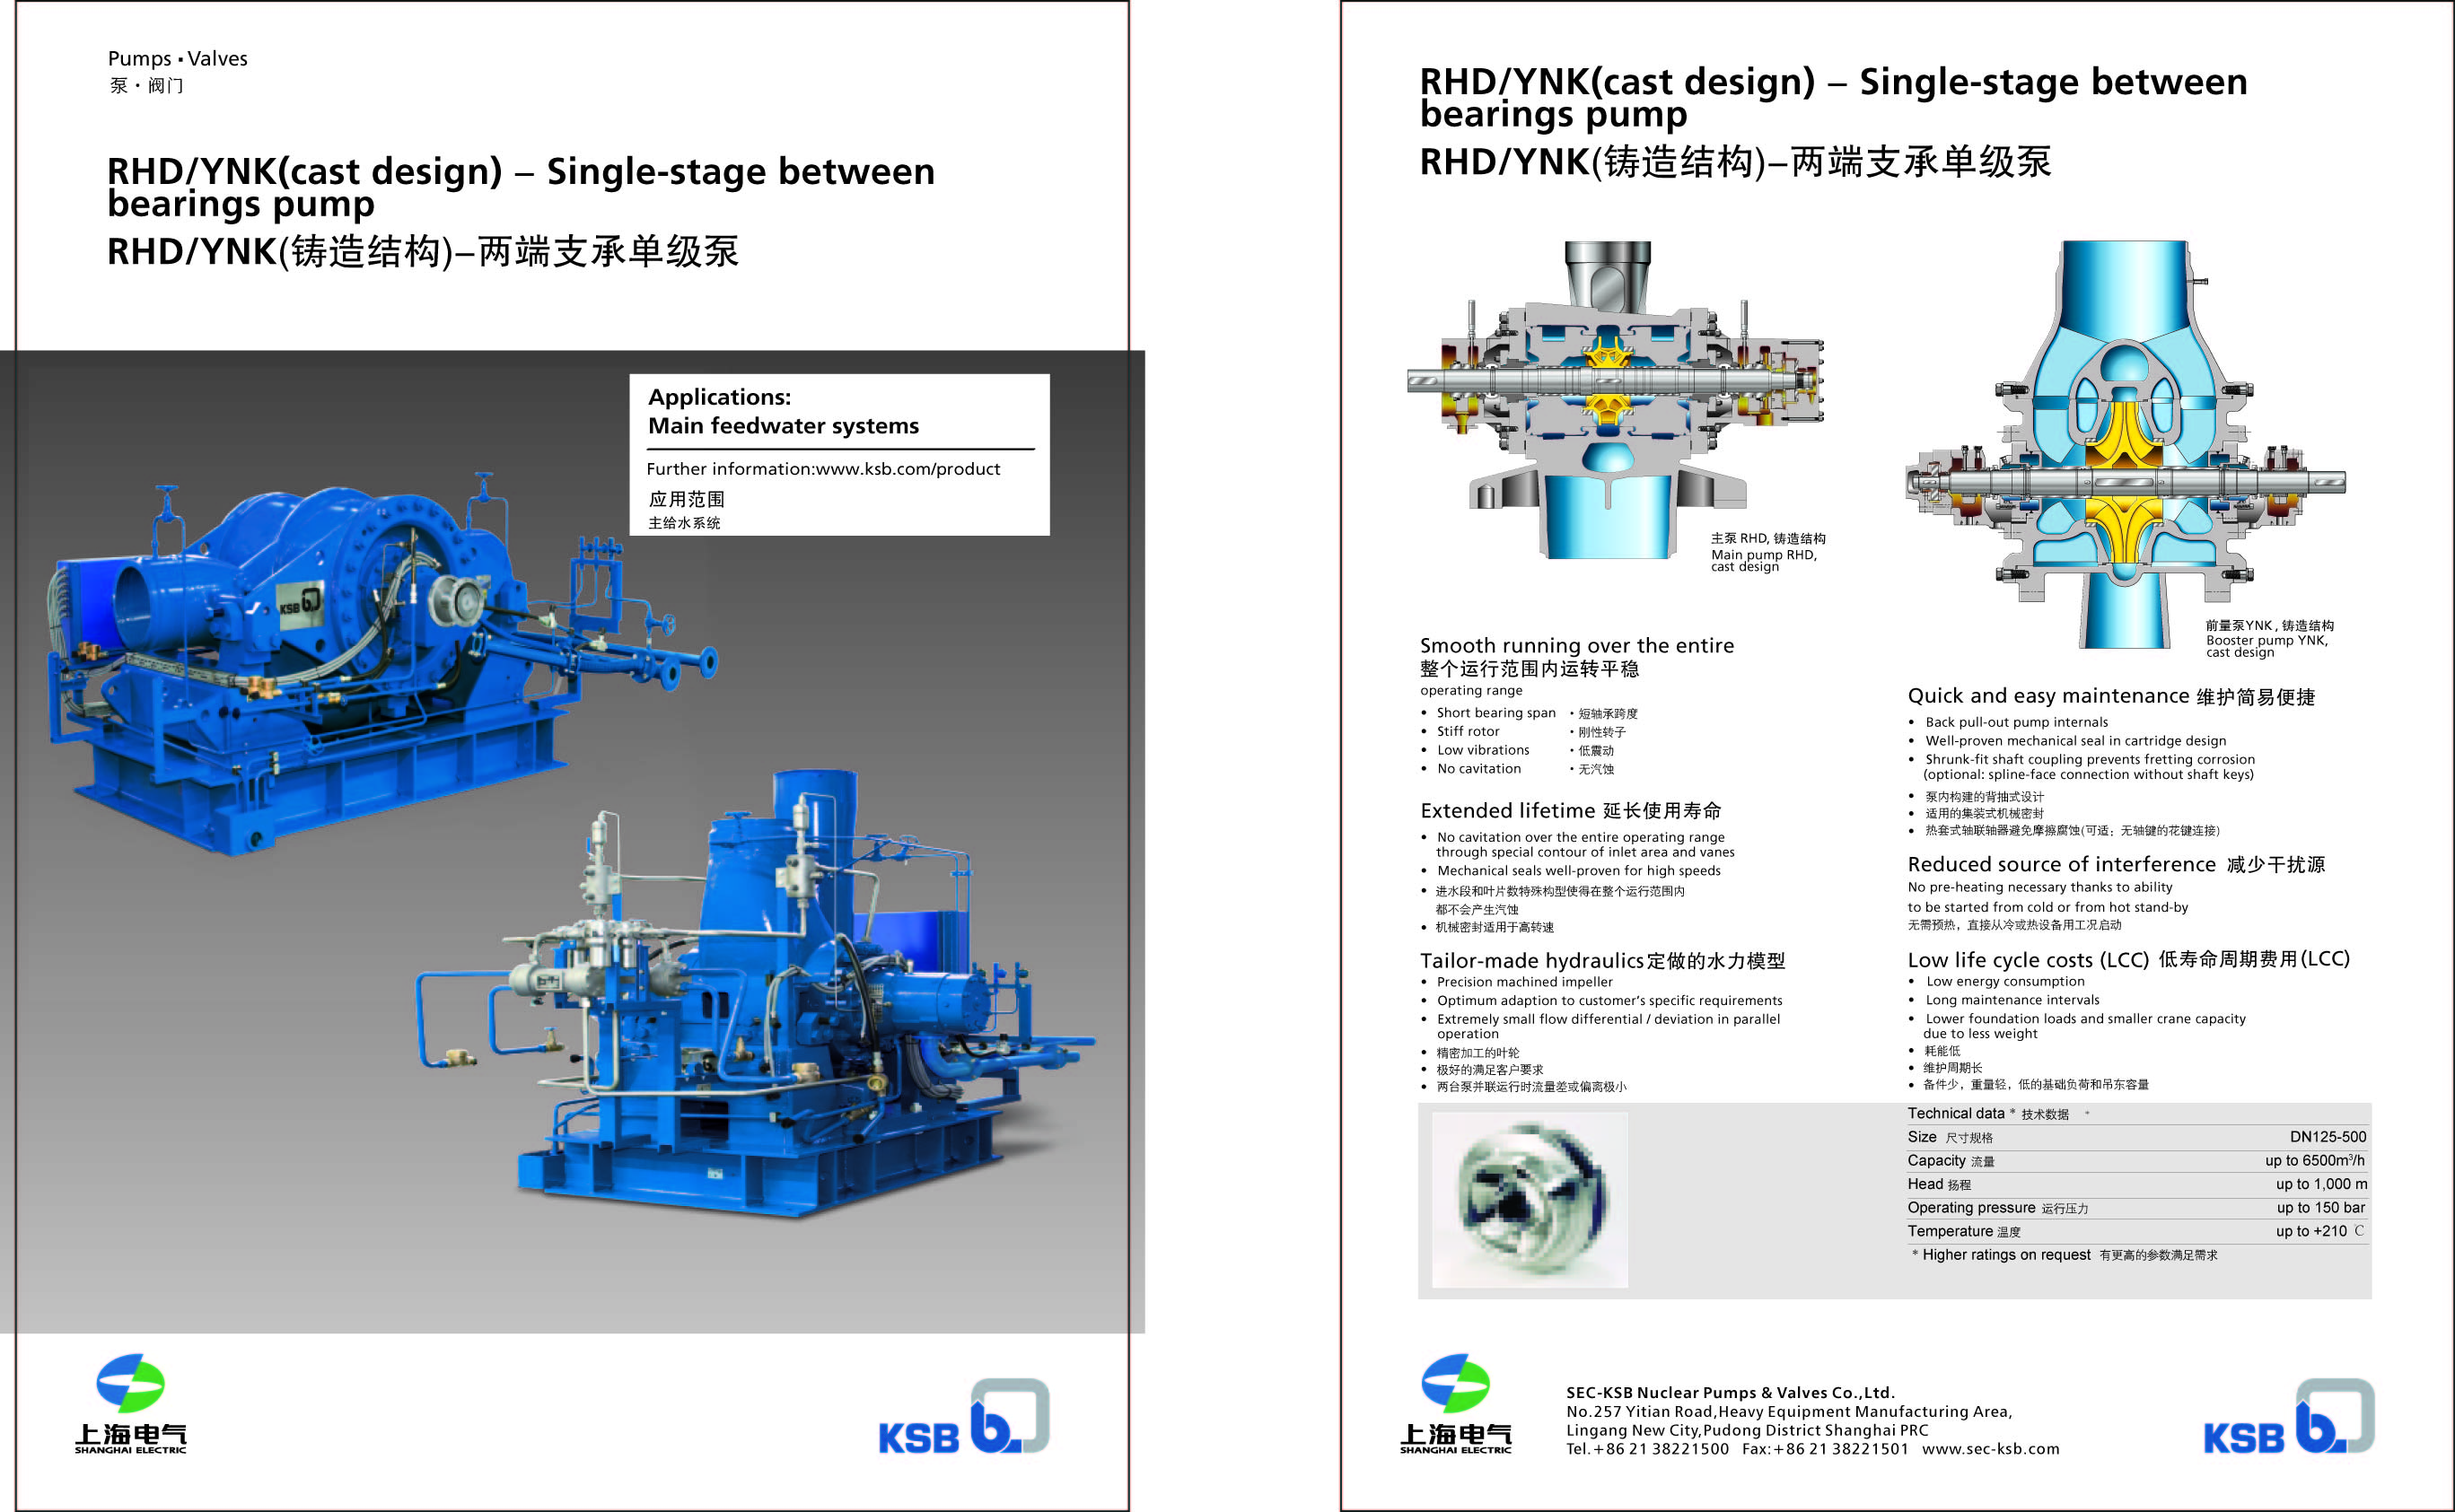 RHD_leaflet_original